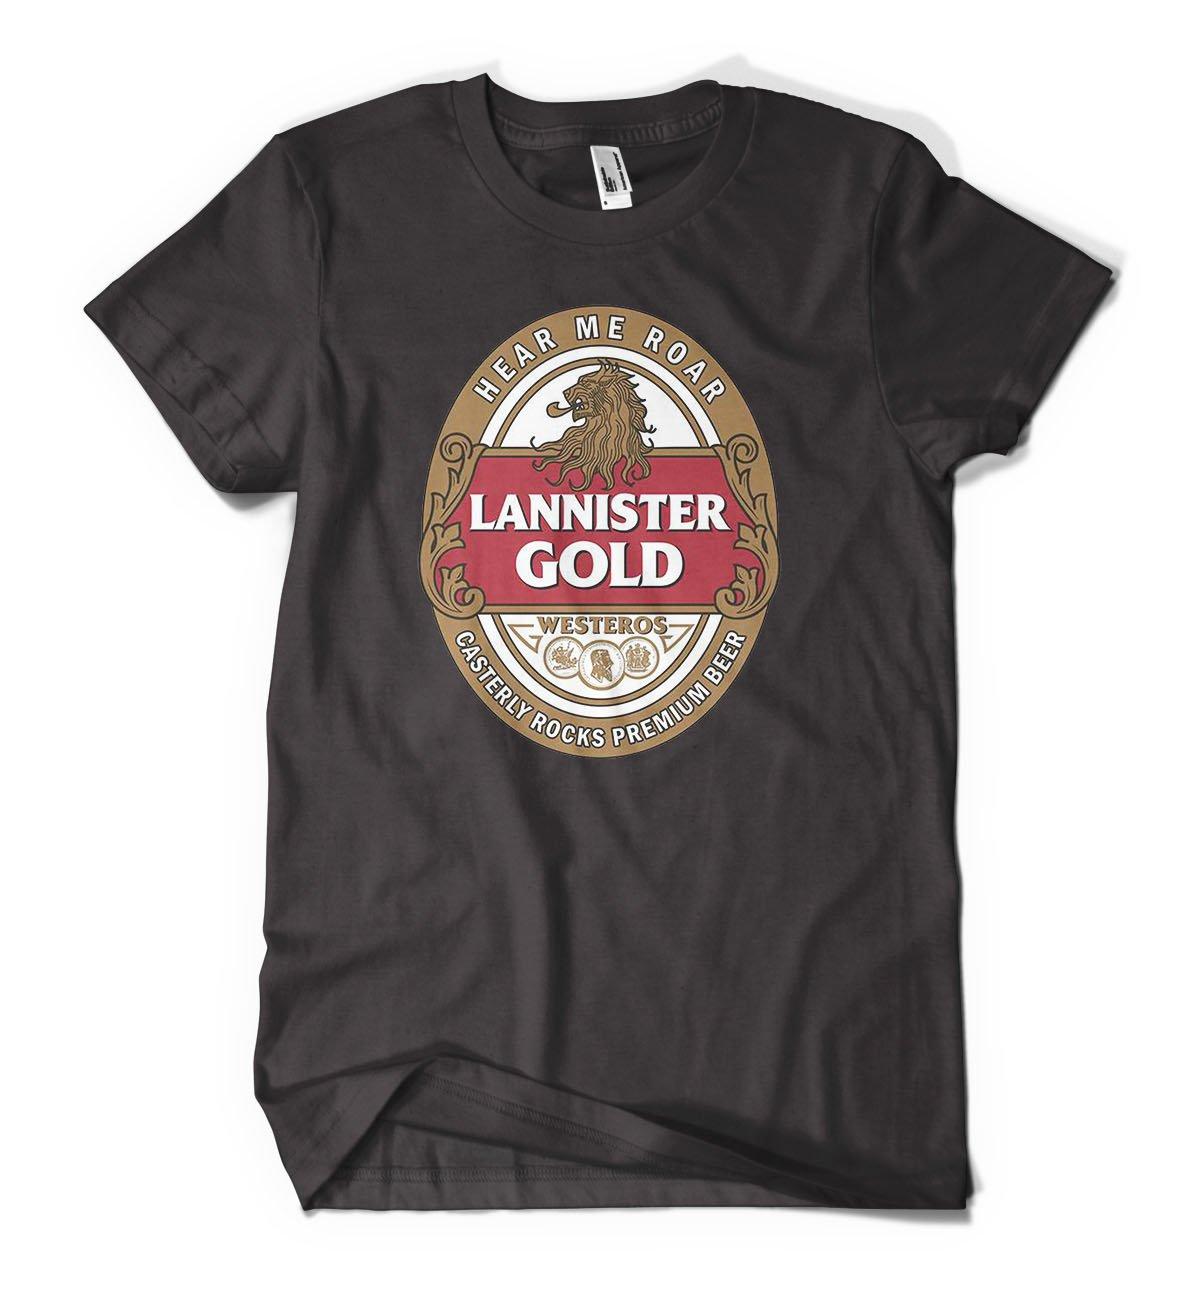 Game Of Thrones Lannister Gold Design Men's Sleeve Cotton Black T-Shirt